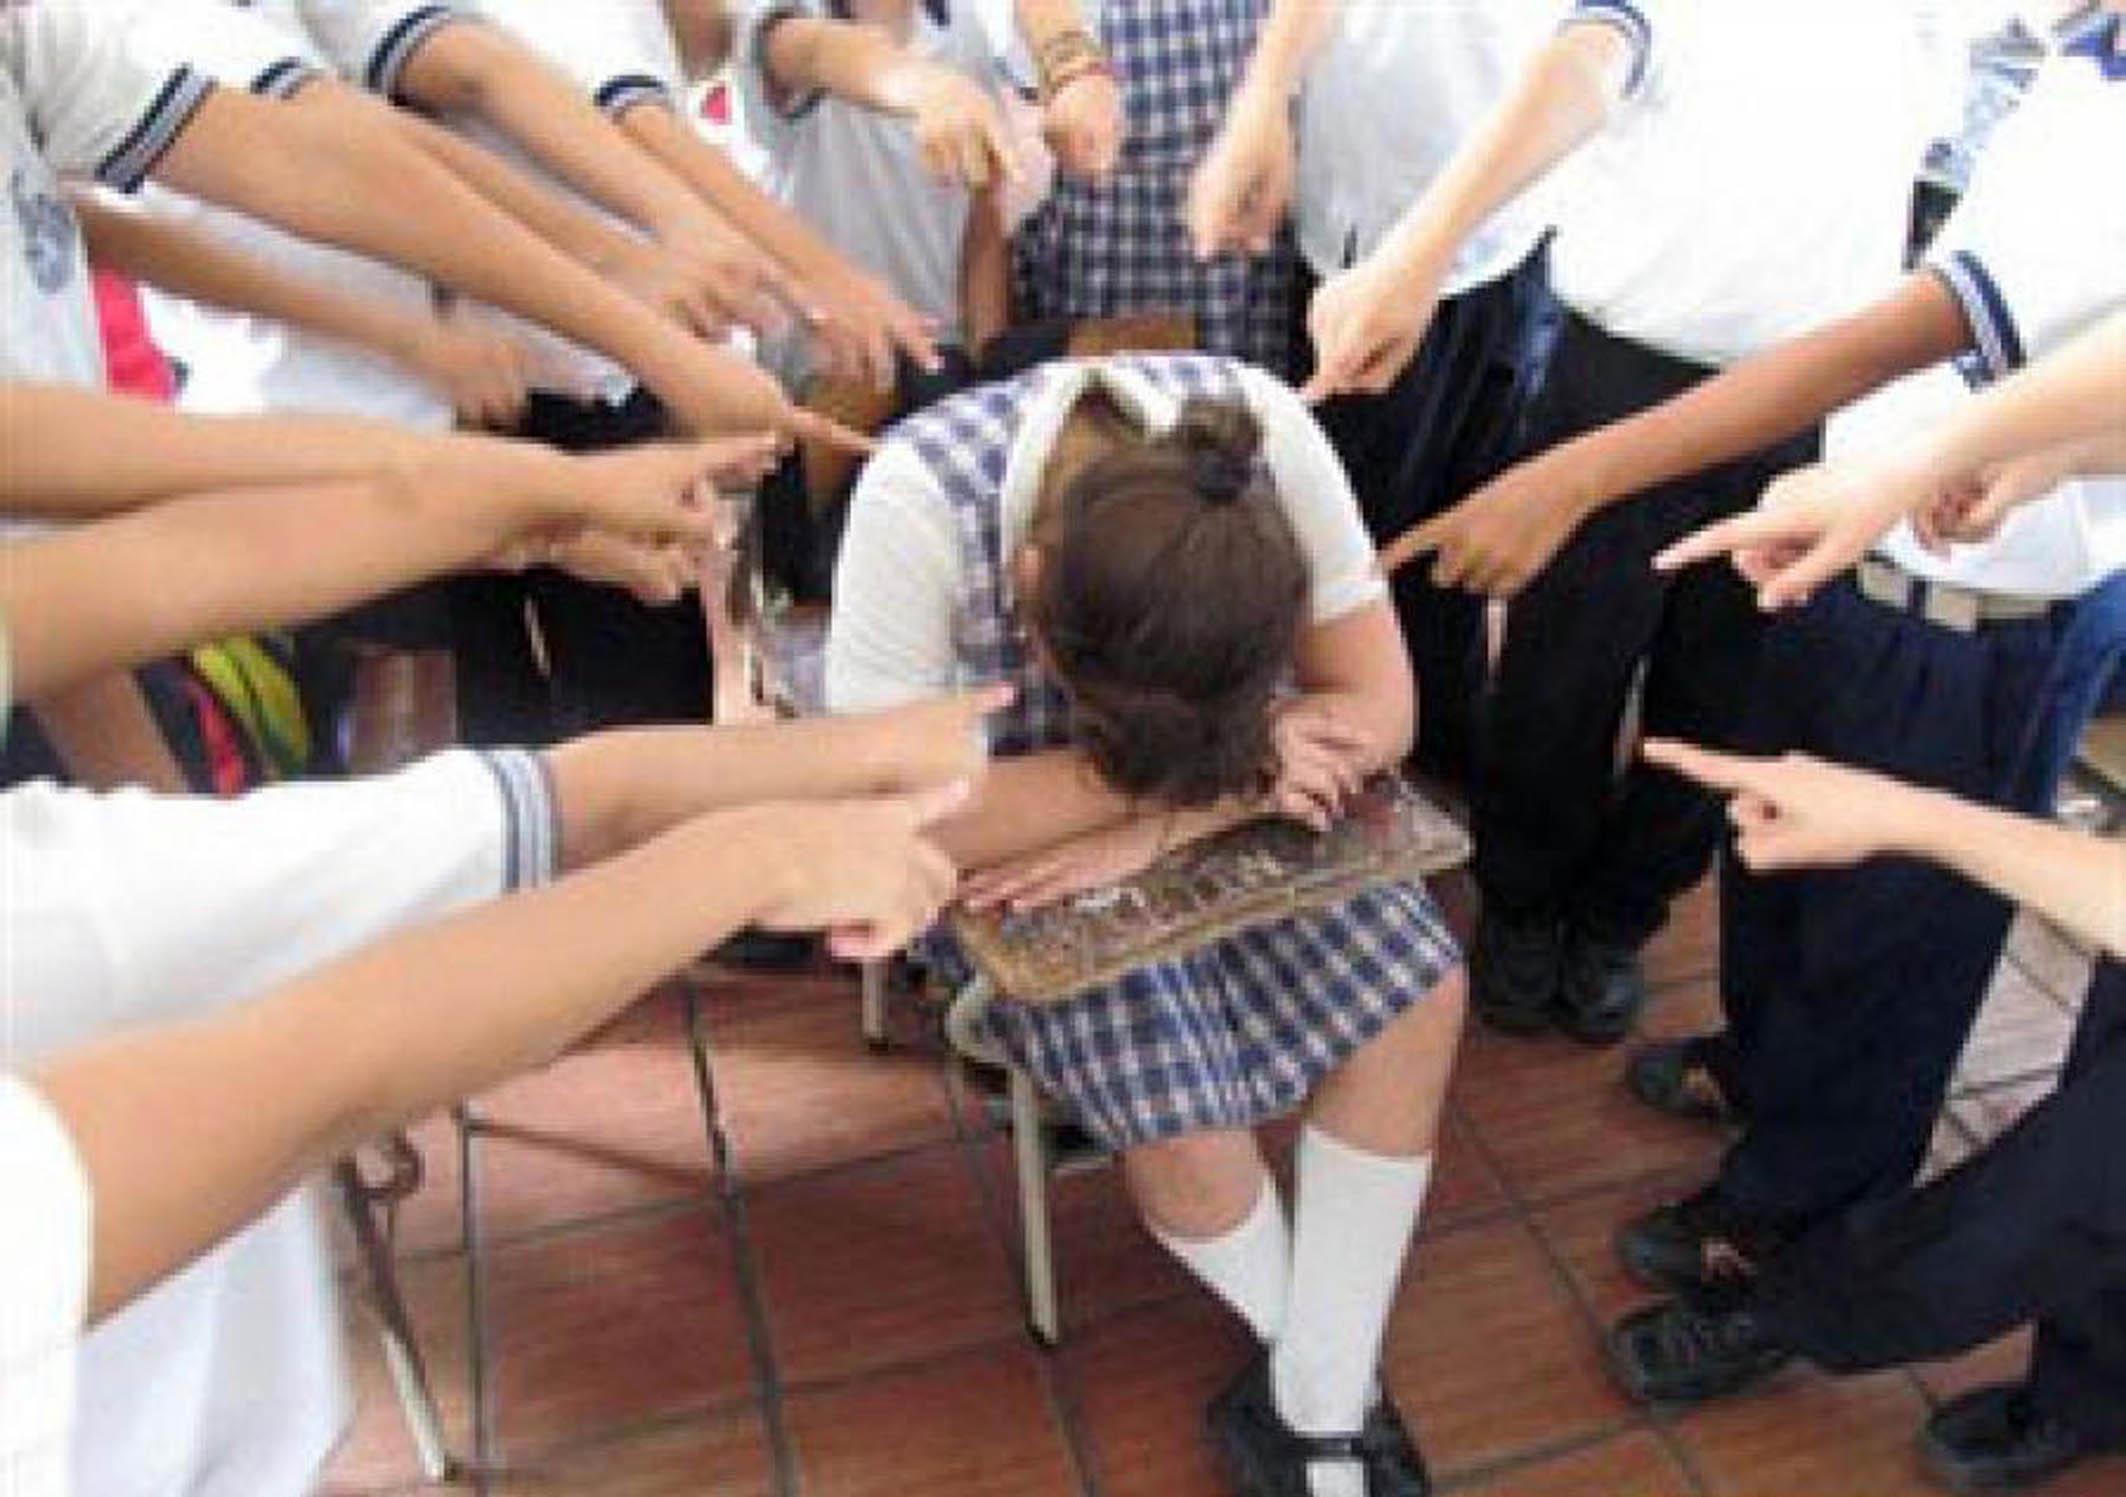 Salud mental vs abuso sexual - ecuadorshafaqnacom